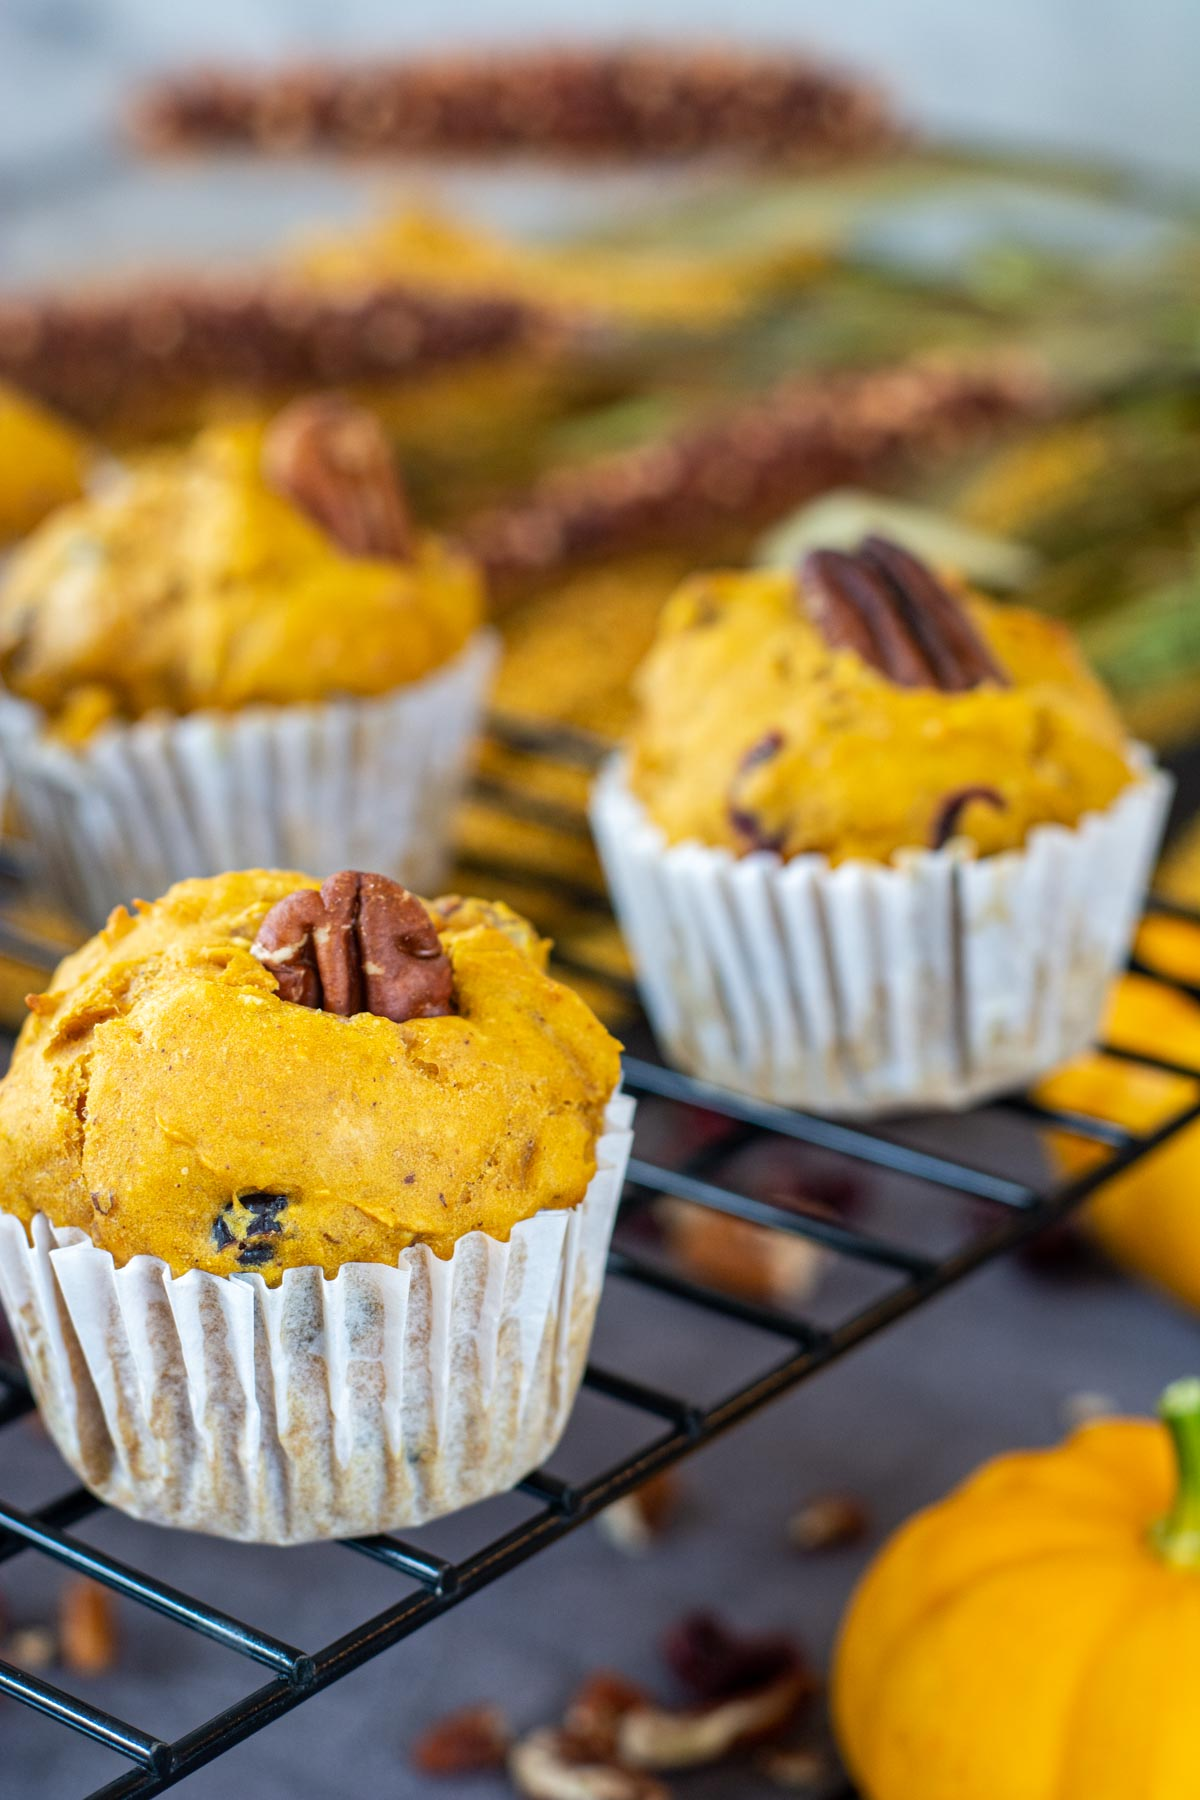 healthy pumpkin and yogurt muffin on a cooling rack.